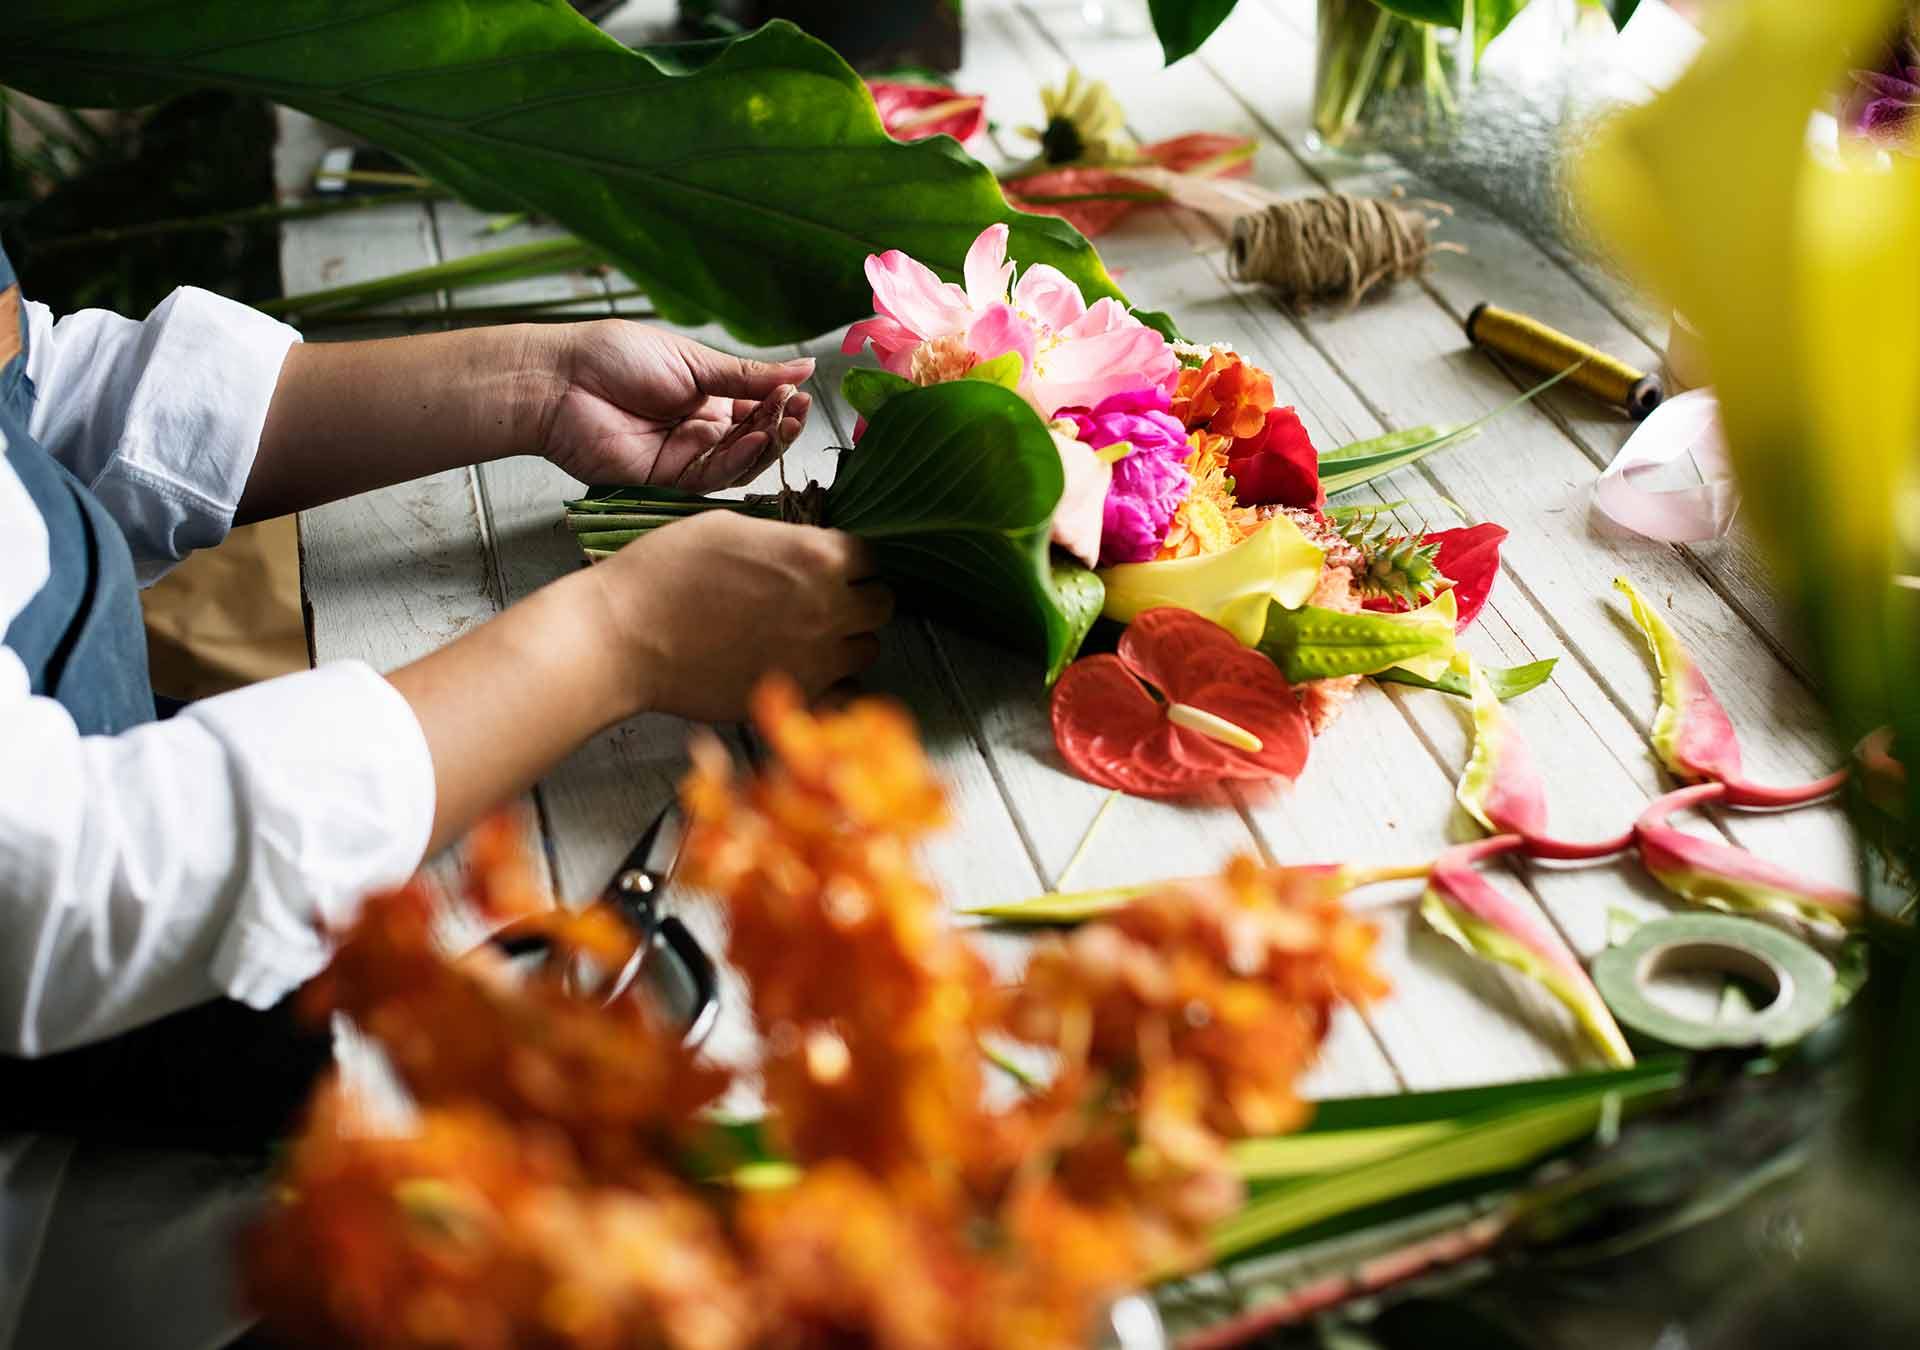 Arreglos florales - Guatemala